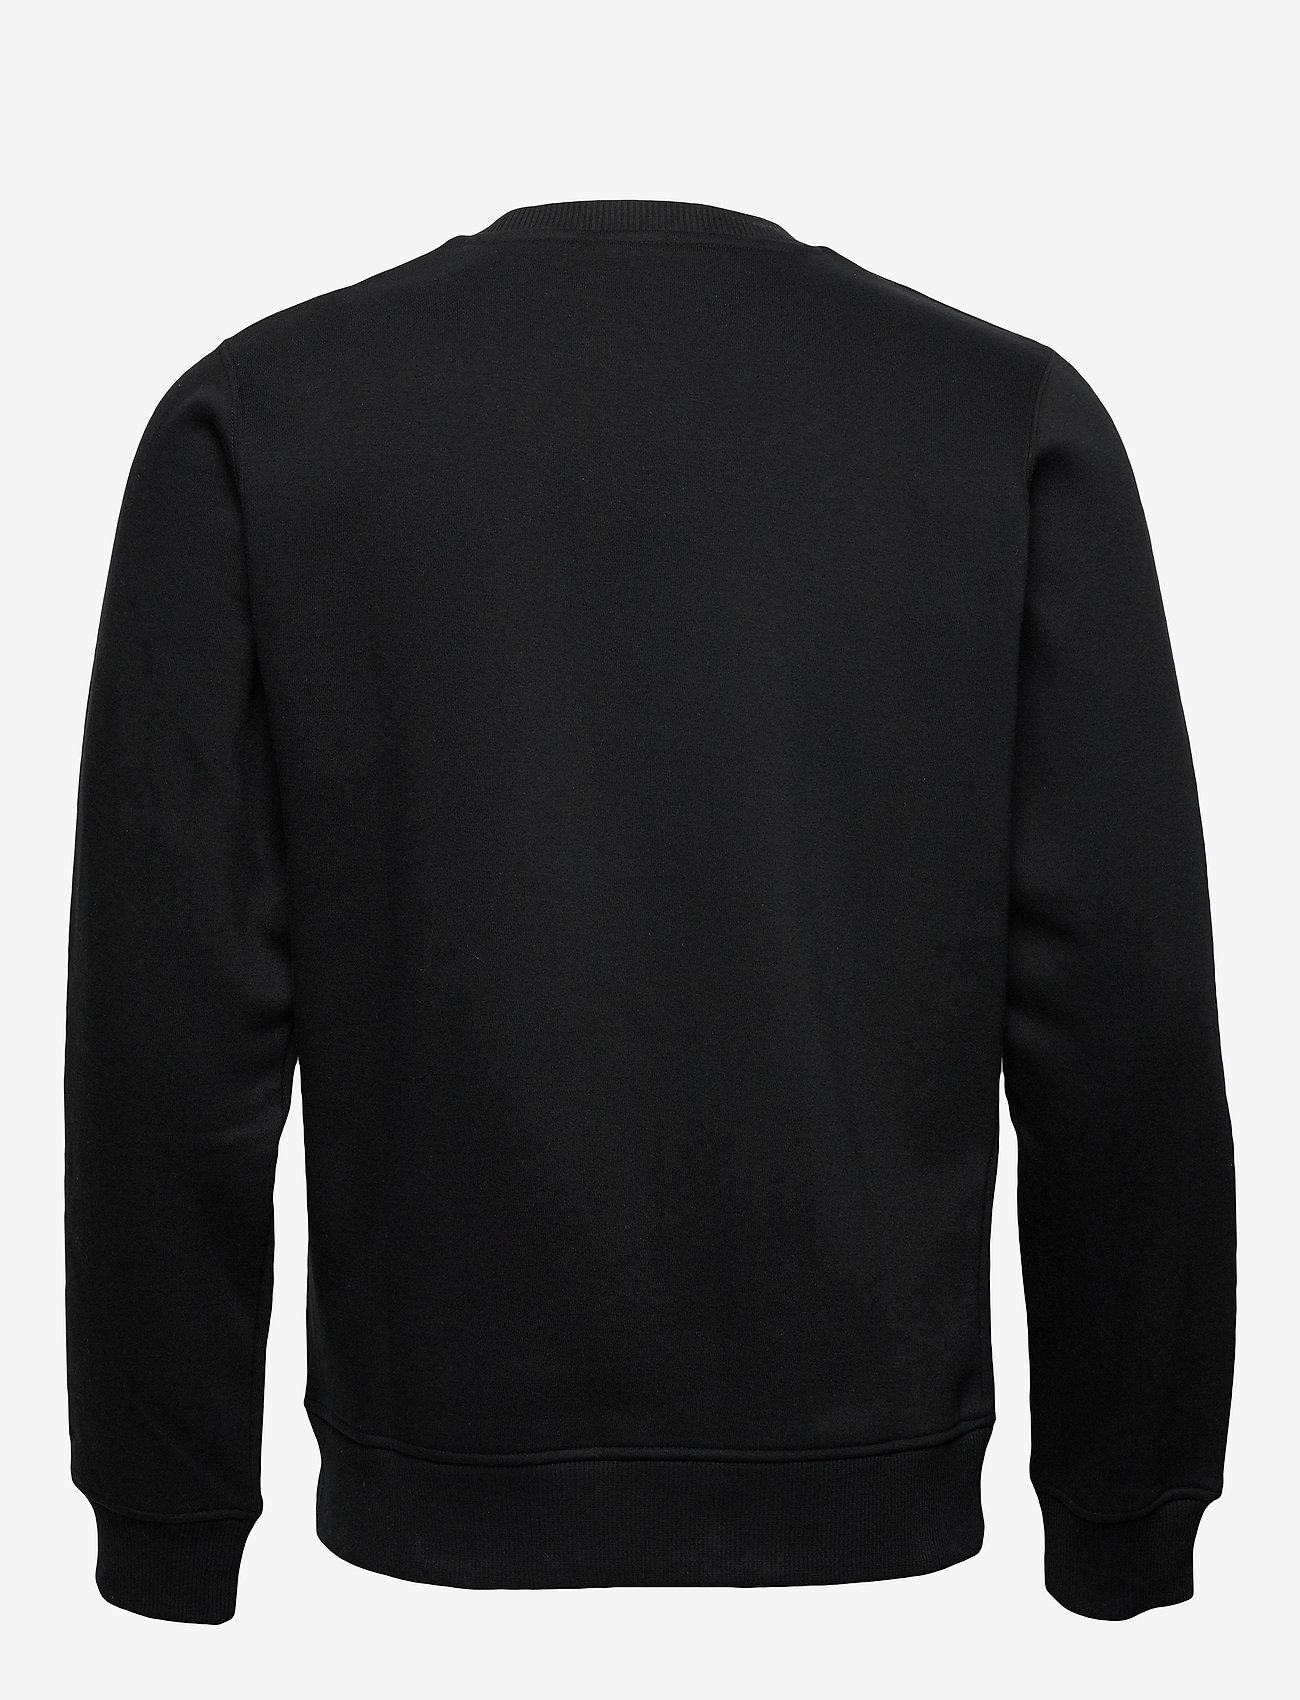 Dickies NEW JERSEY - Sweatshirts BLACK - Menn Klær